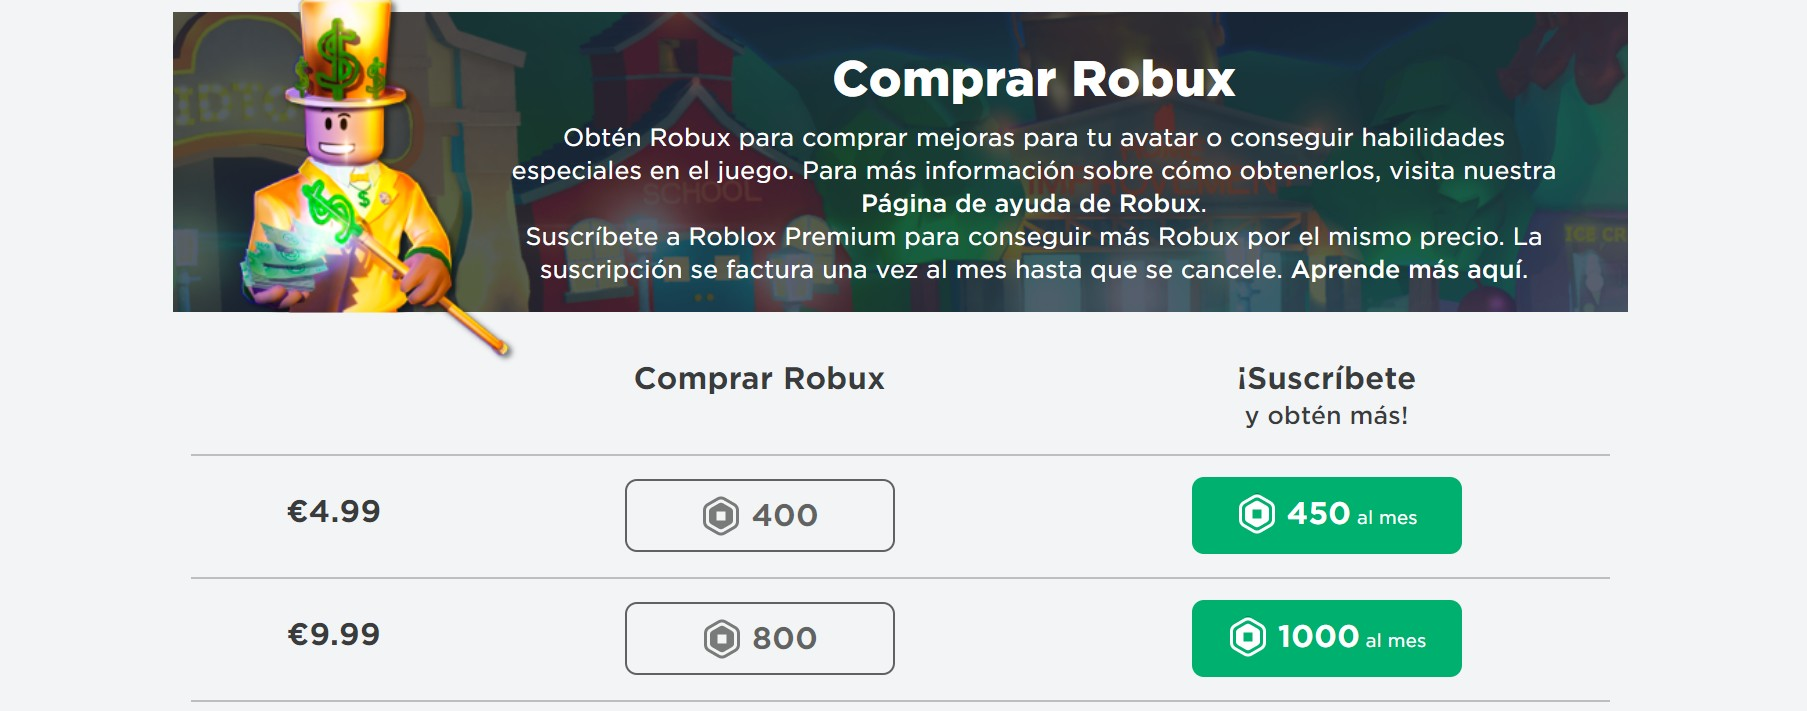 Cuanto Cuesta 400 Robux En Pesos Chilenos Como Comprar Robux En Roblox En Pc Android E Ios 2020 Libretilla